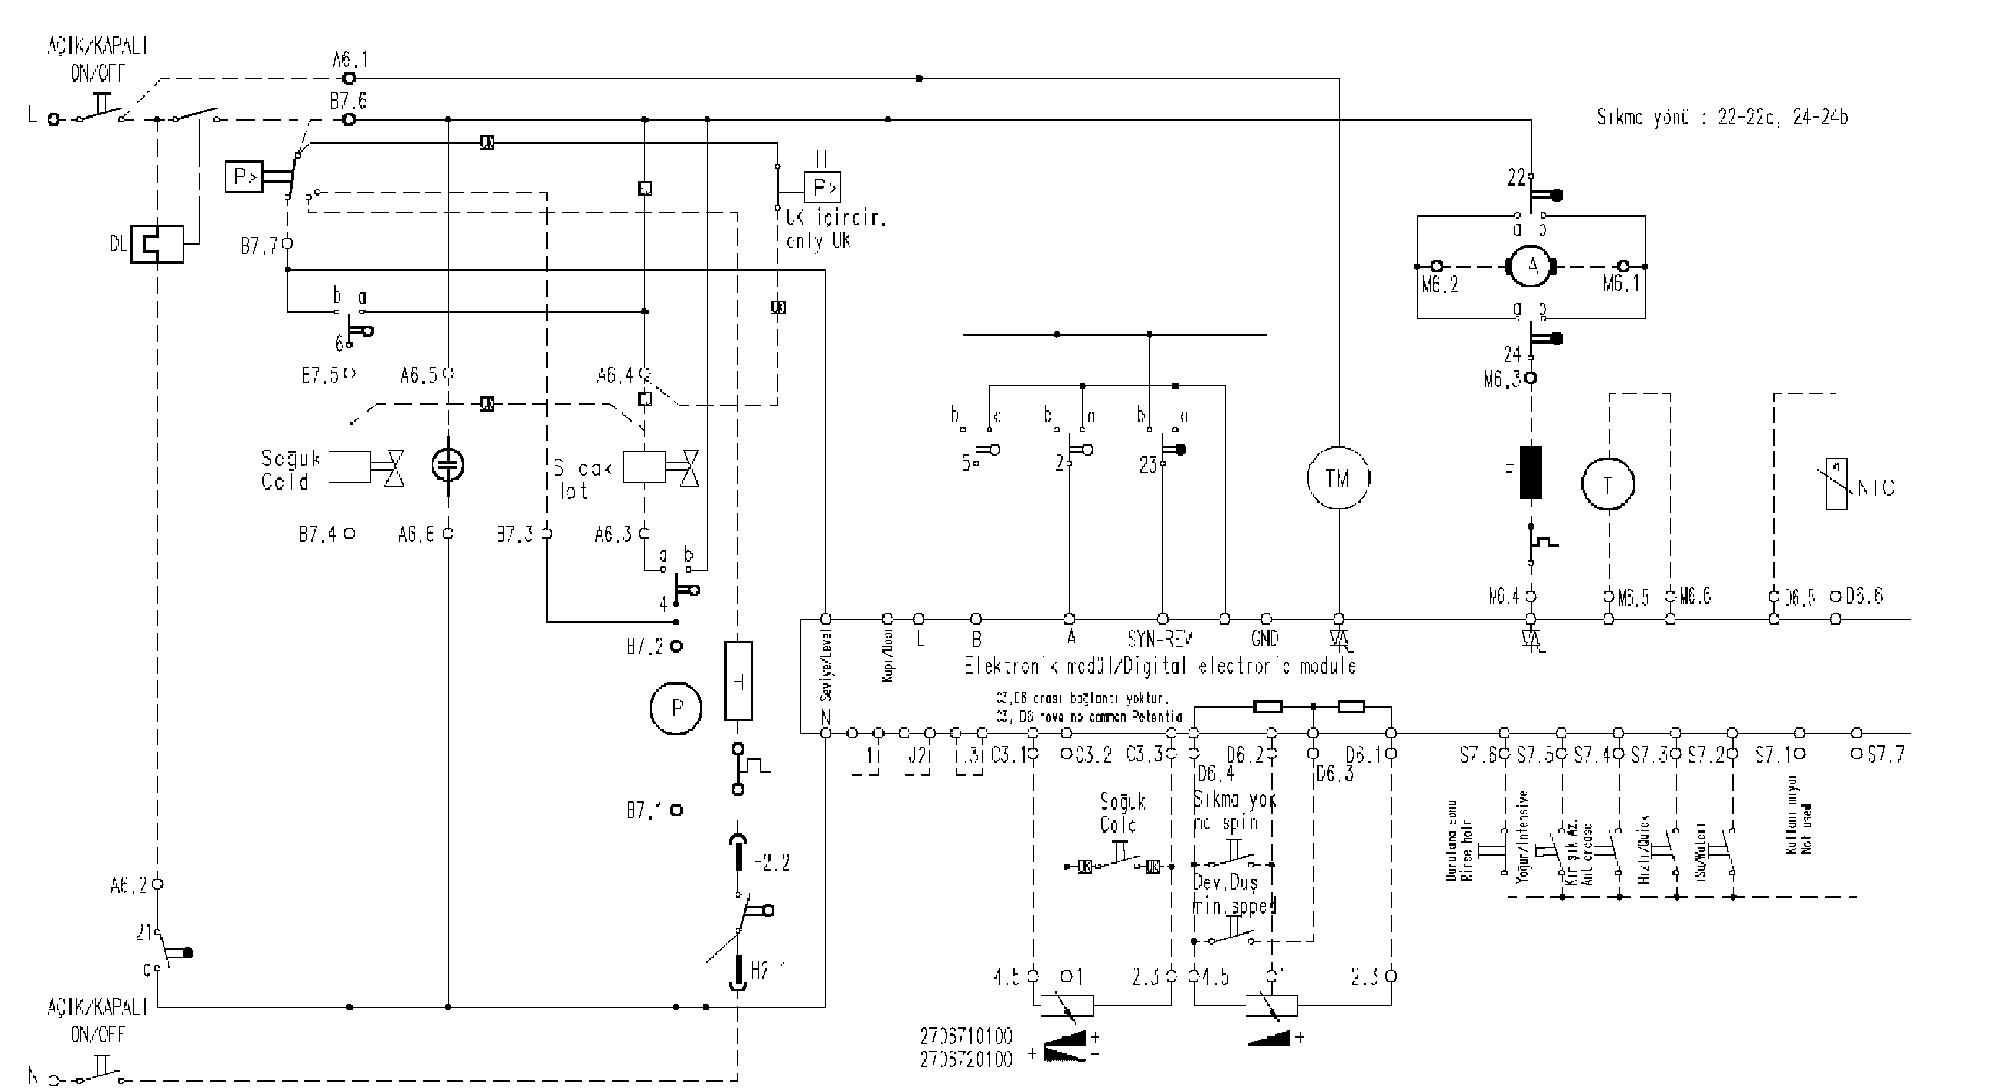 Beko Cg970 Fridge Spares Freezer K59 Thermostat Wiring Diagram